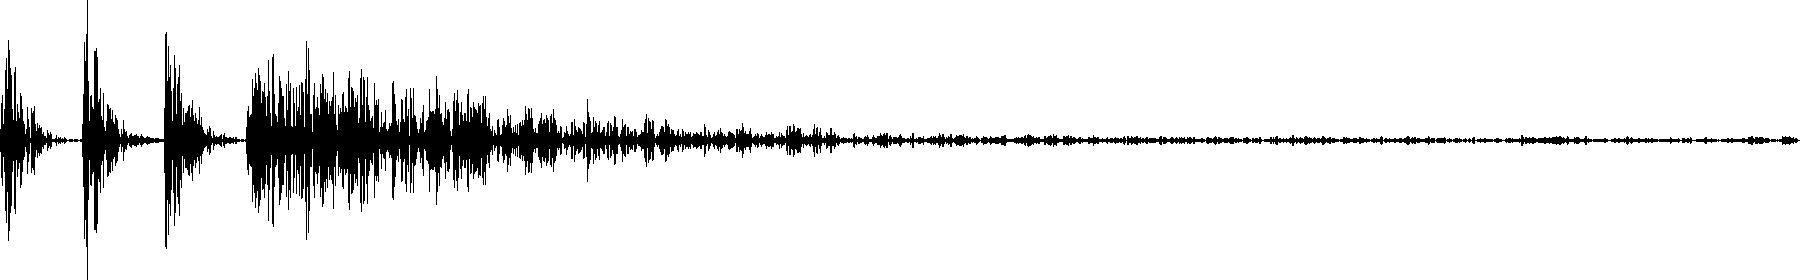 110clp